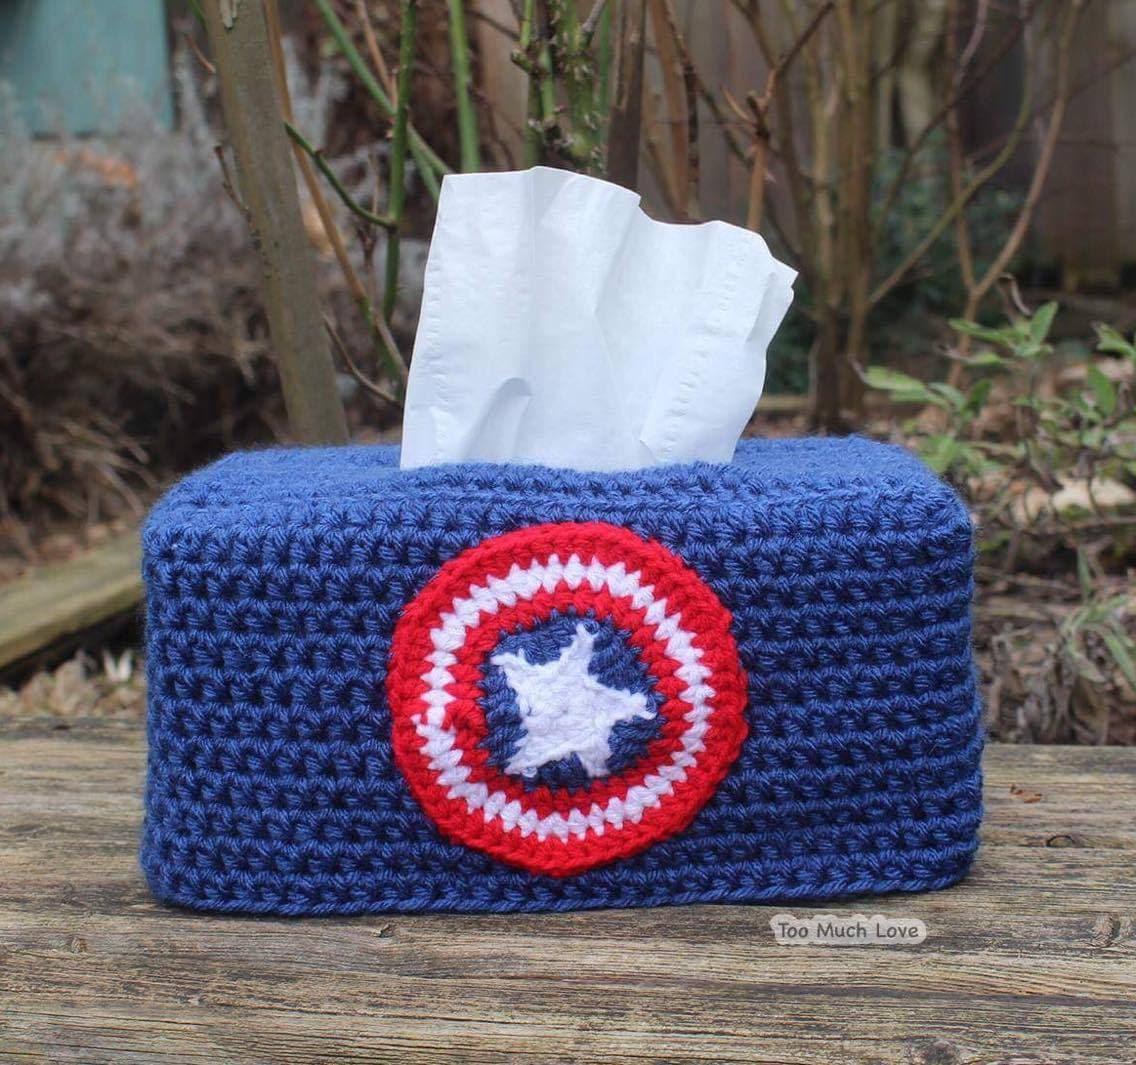 Crochet Tissue Box Cover Base & Variations PATTERN